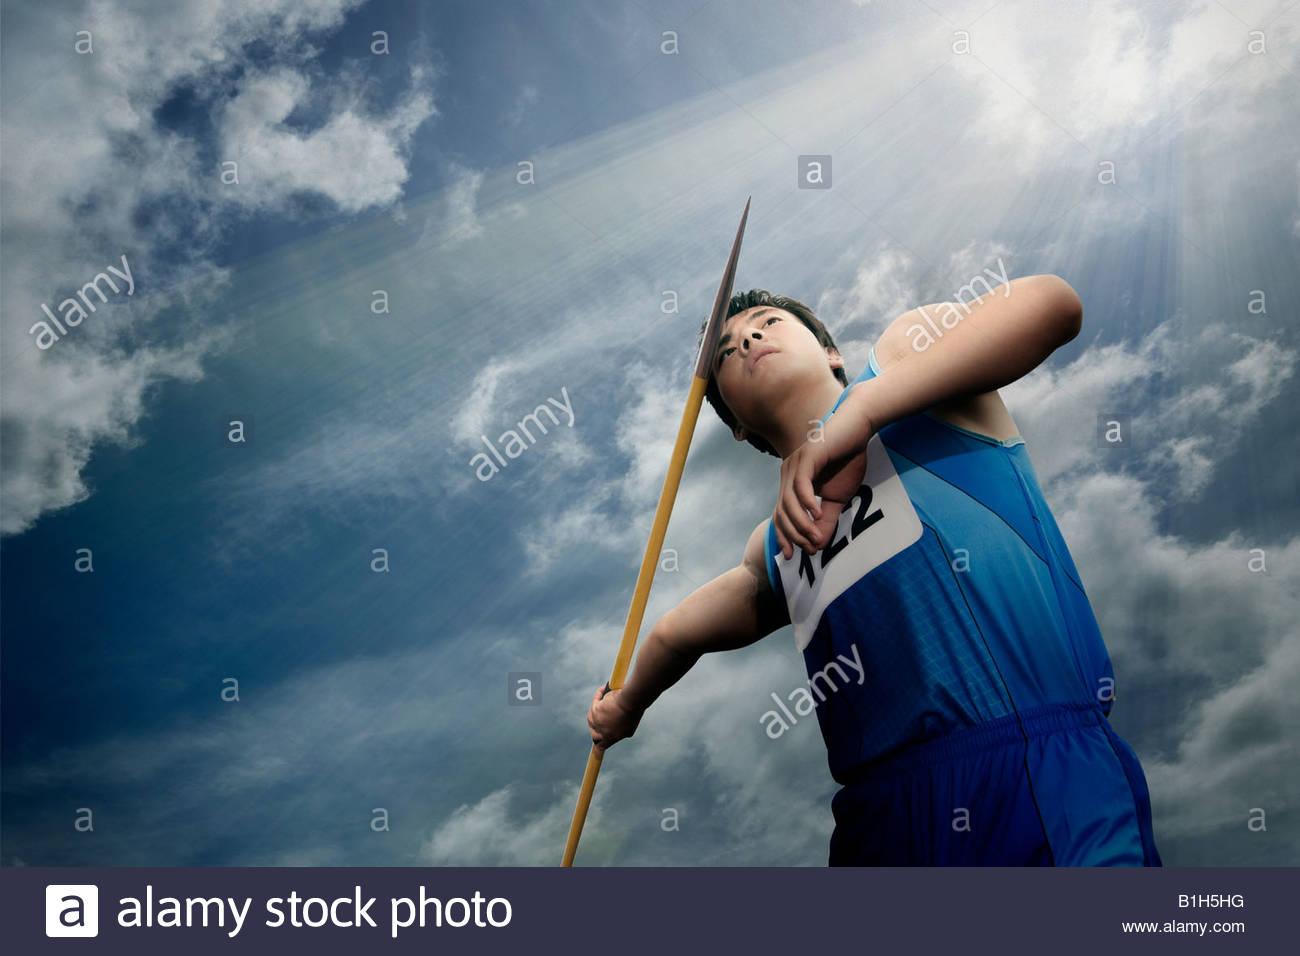 Javelin thrower - Stock Image